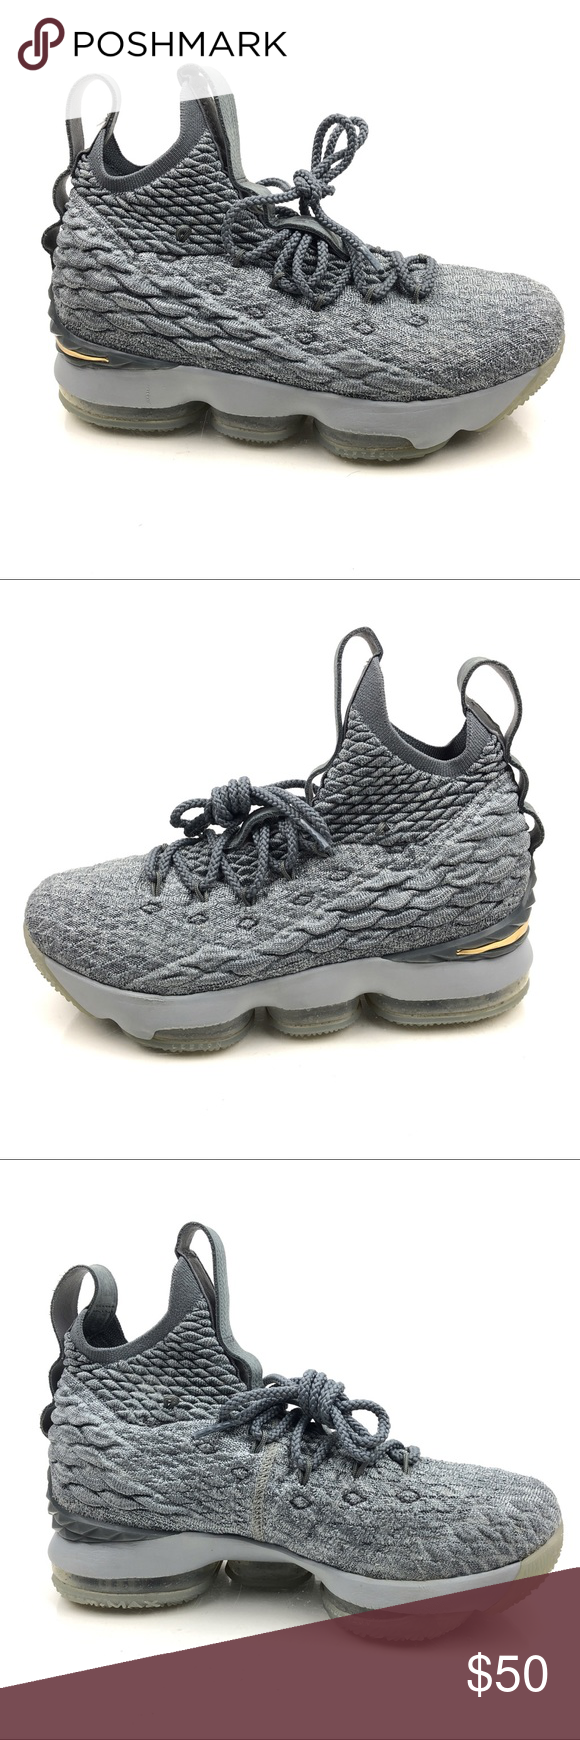 Youth basketball shoes, Nike lebron